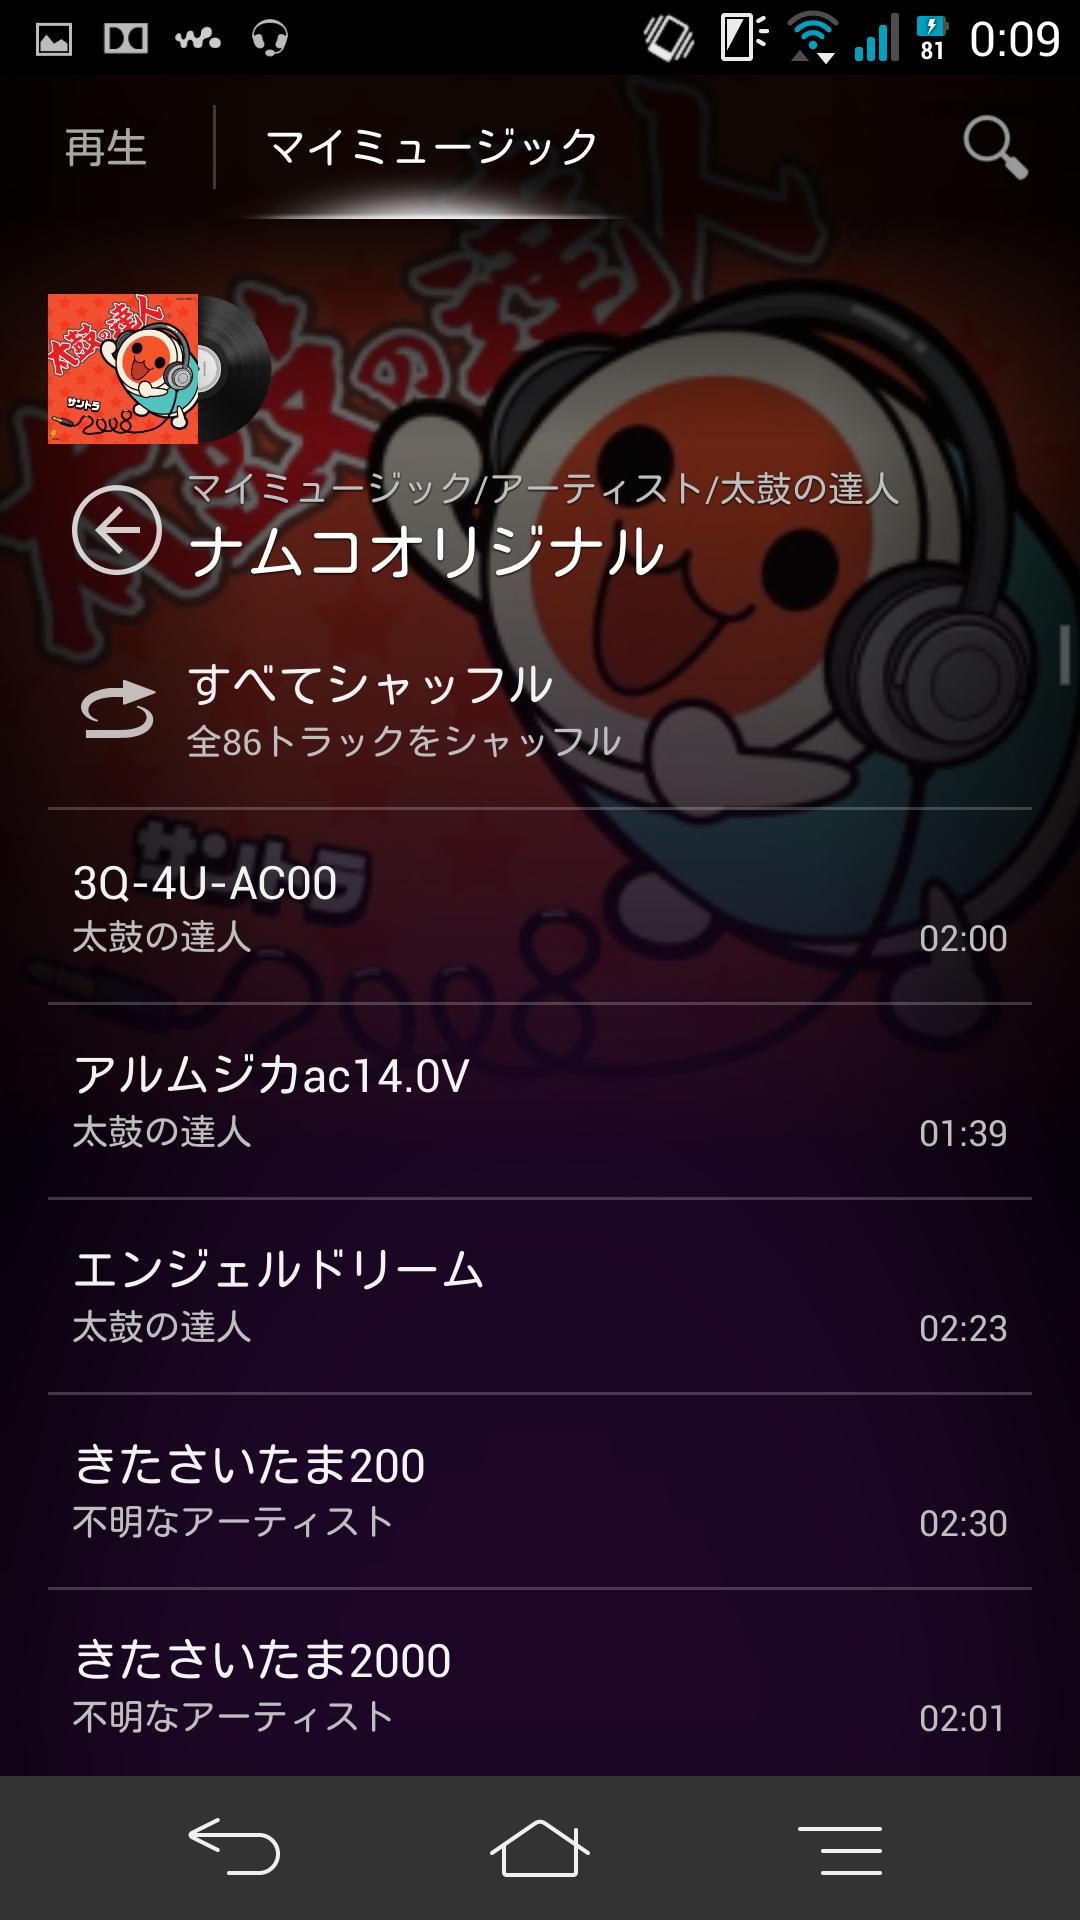 Screenshot_2014-08-12-00-09-12.png